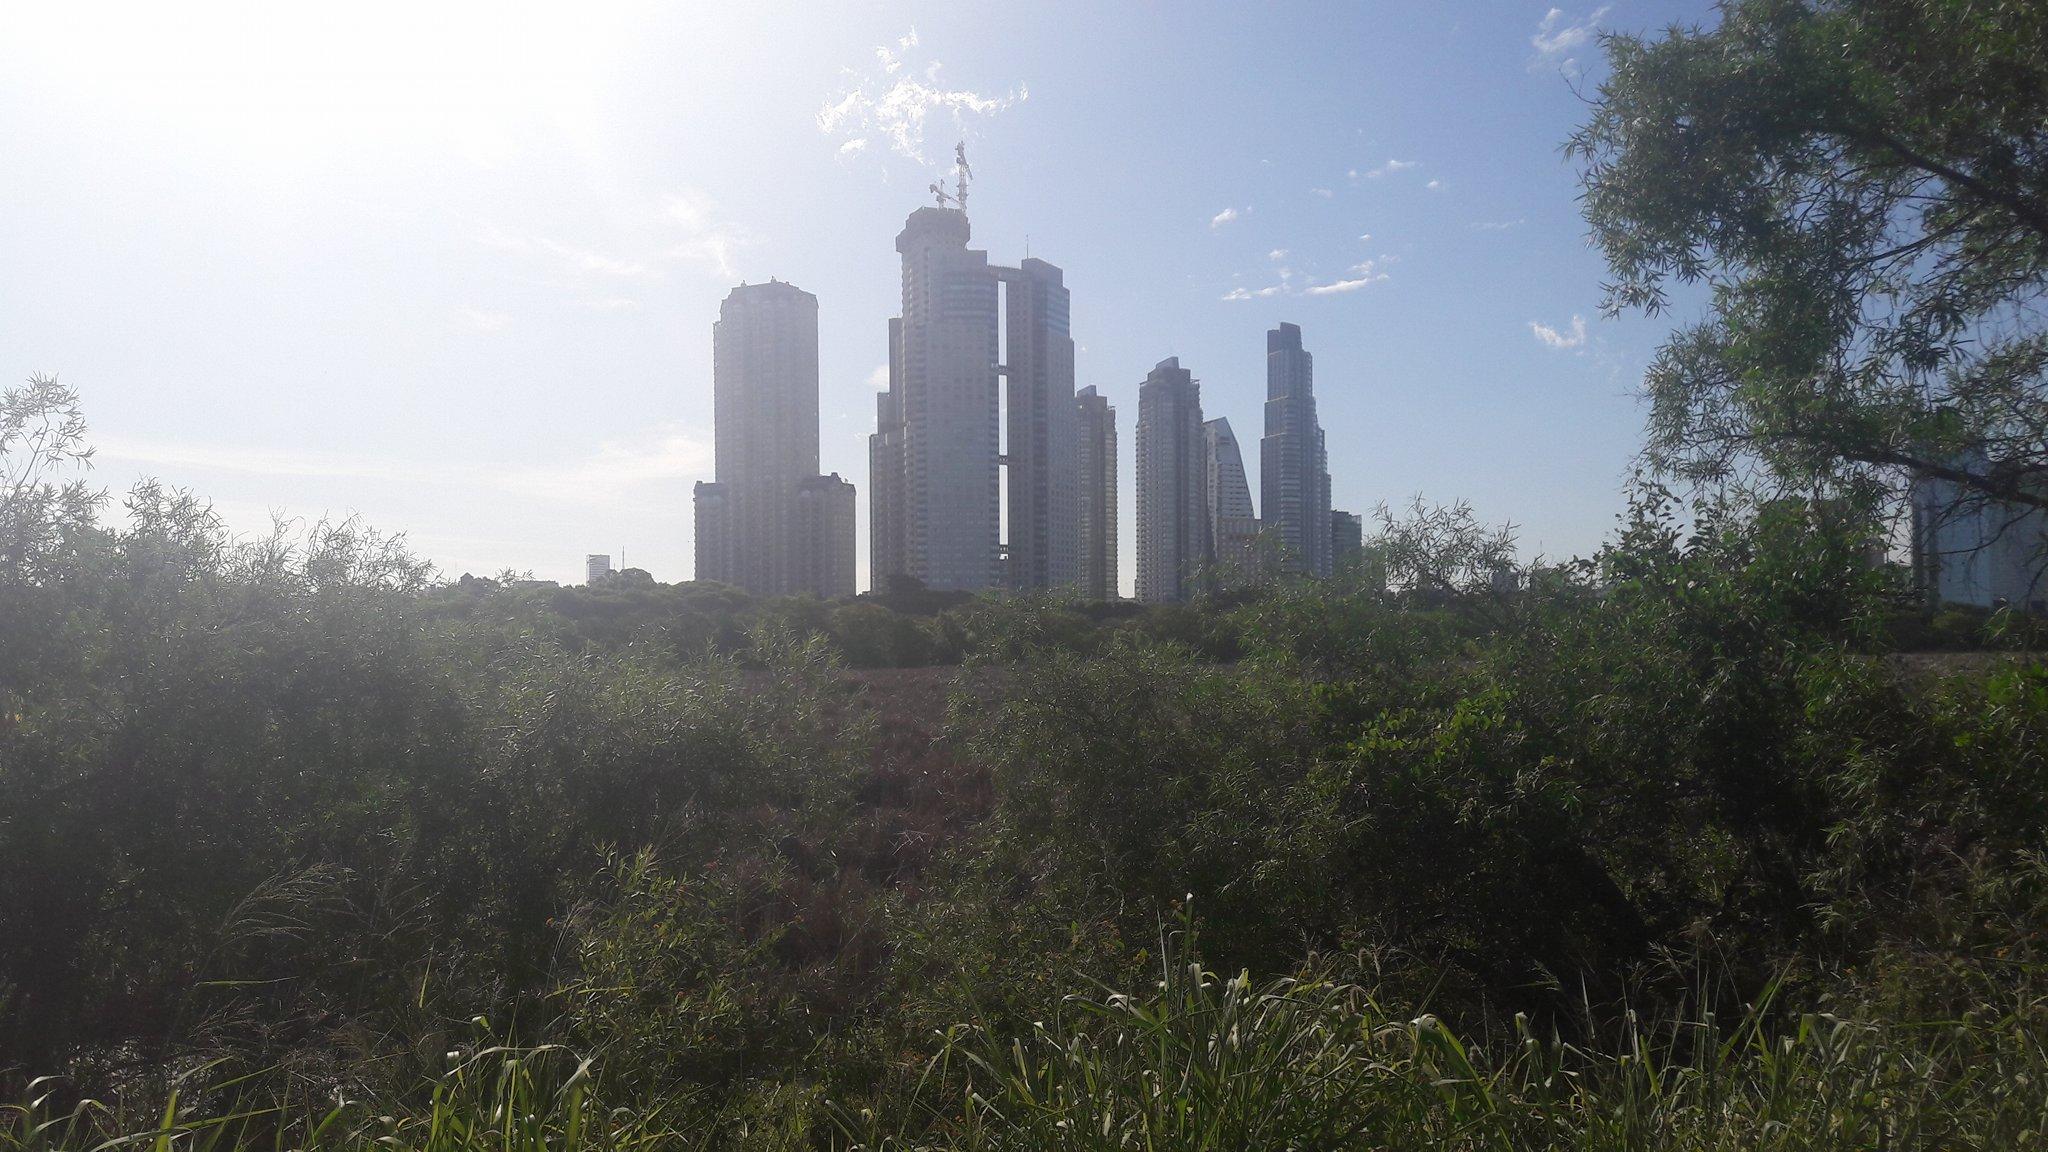 08.12.16 Skyline aus dem Park